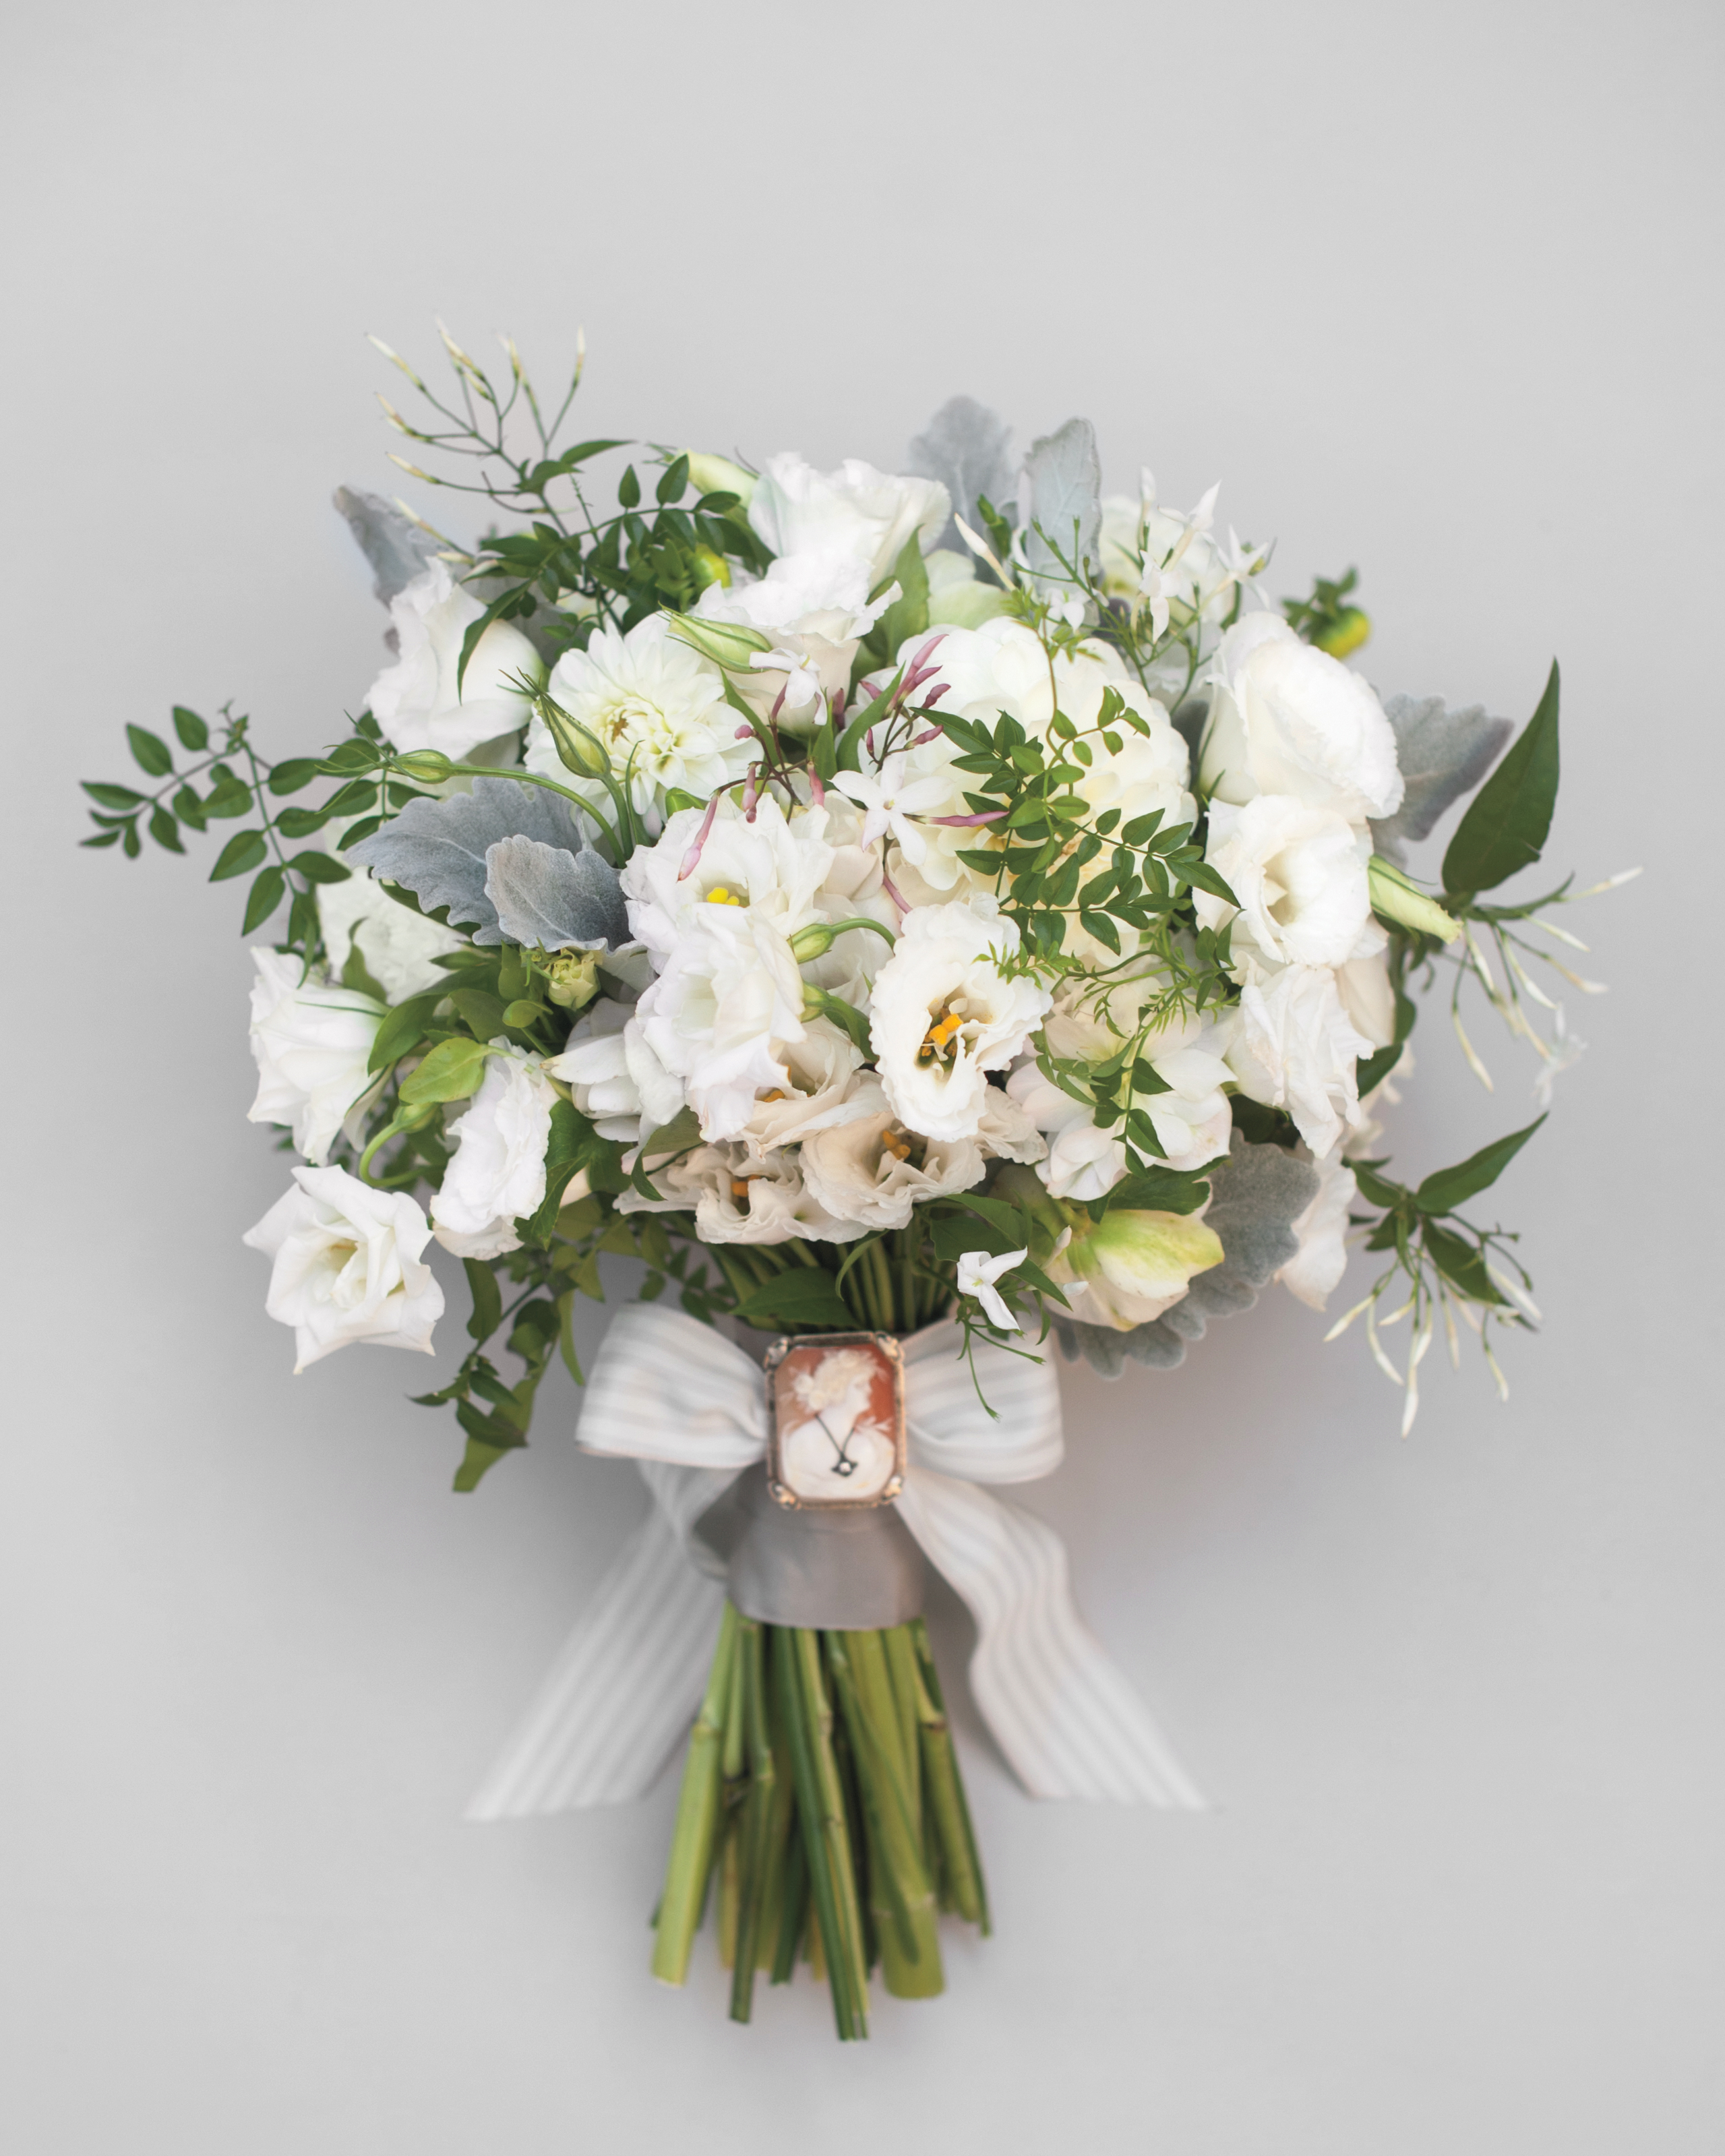 bouquet-day-1-6-mwd110629.jpg